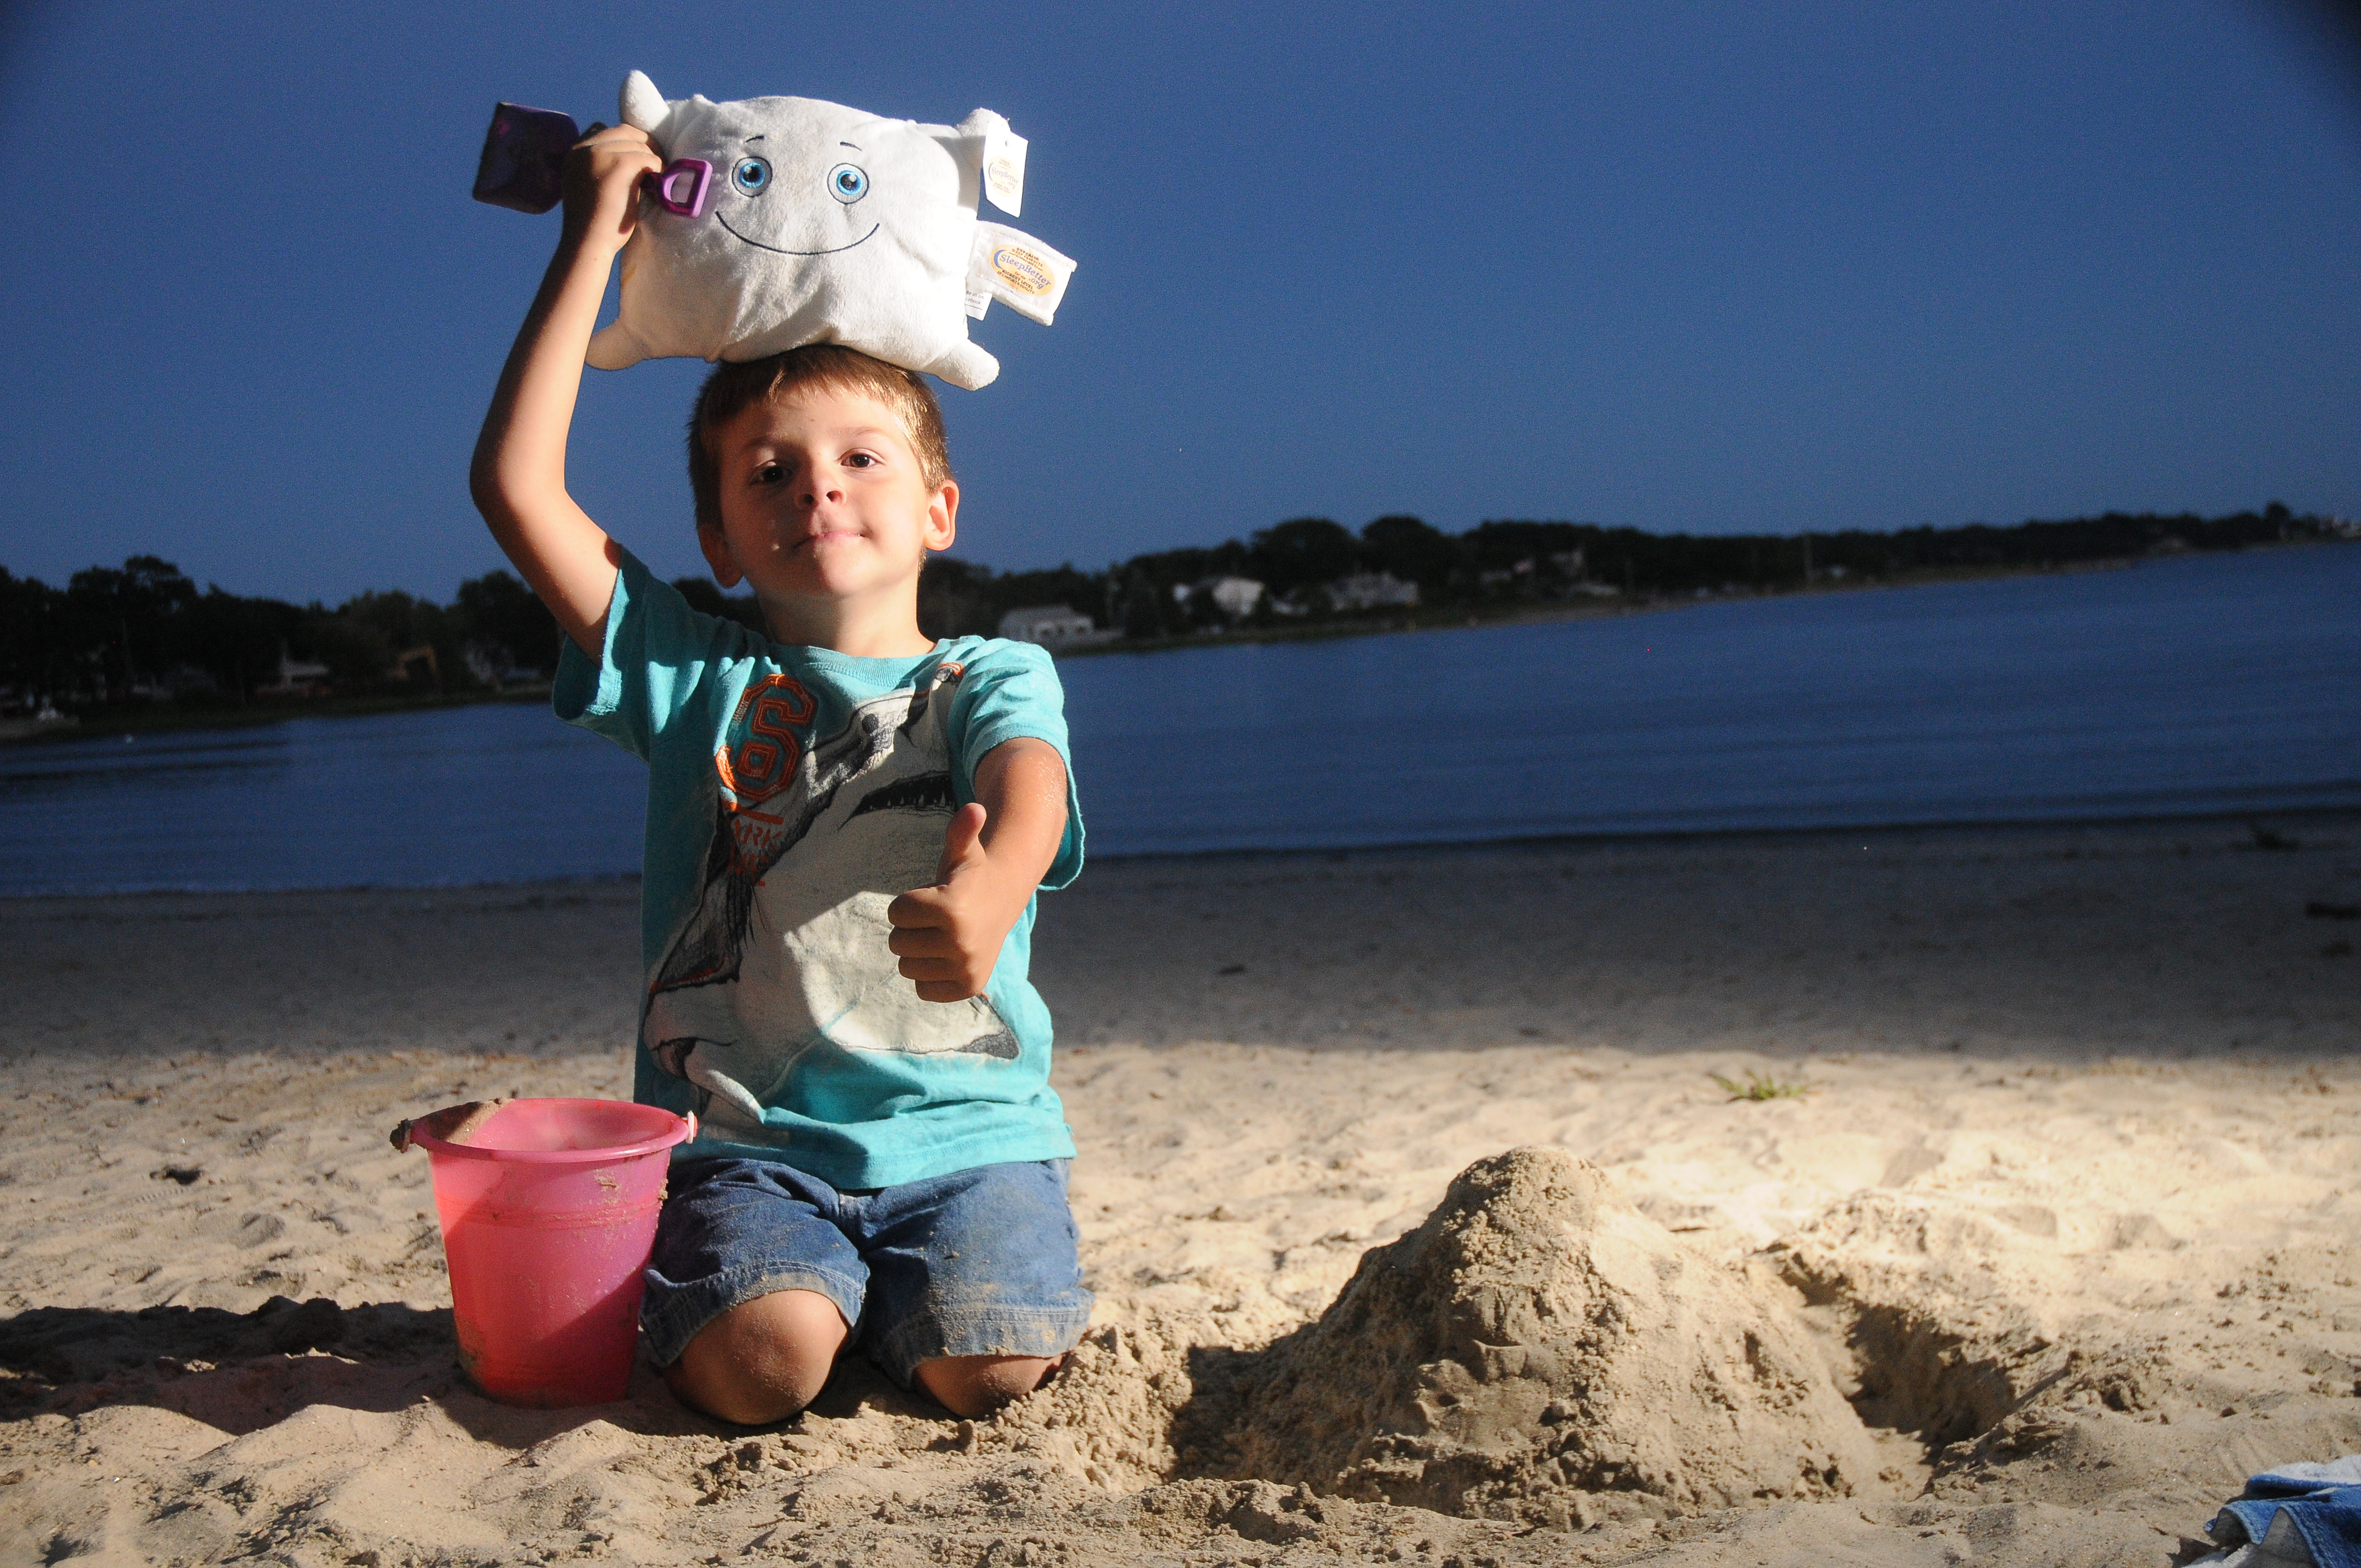 Pillow Featherbed building a sand castle